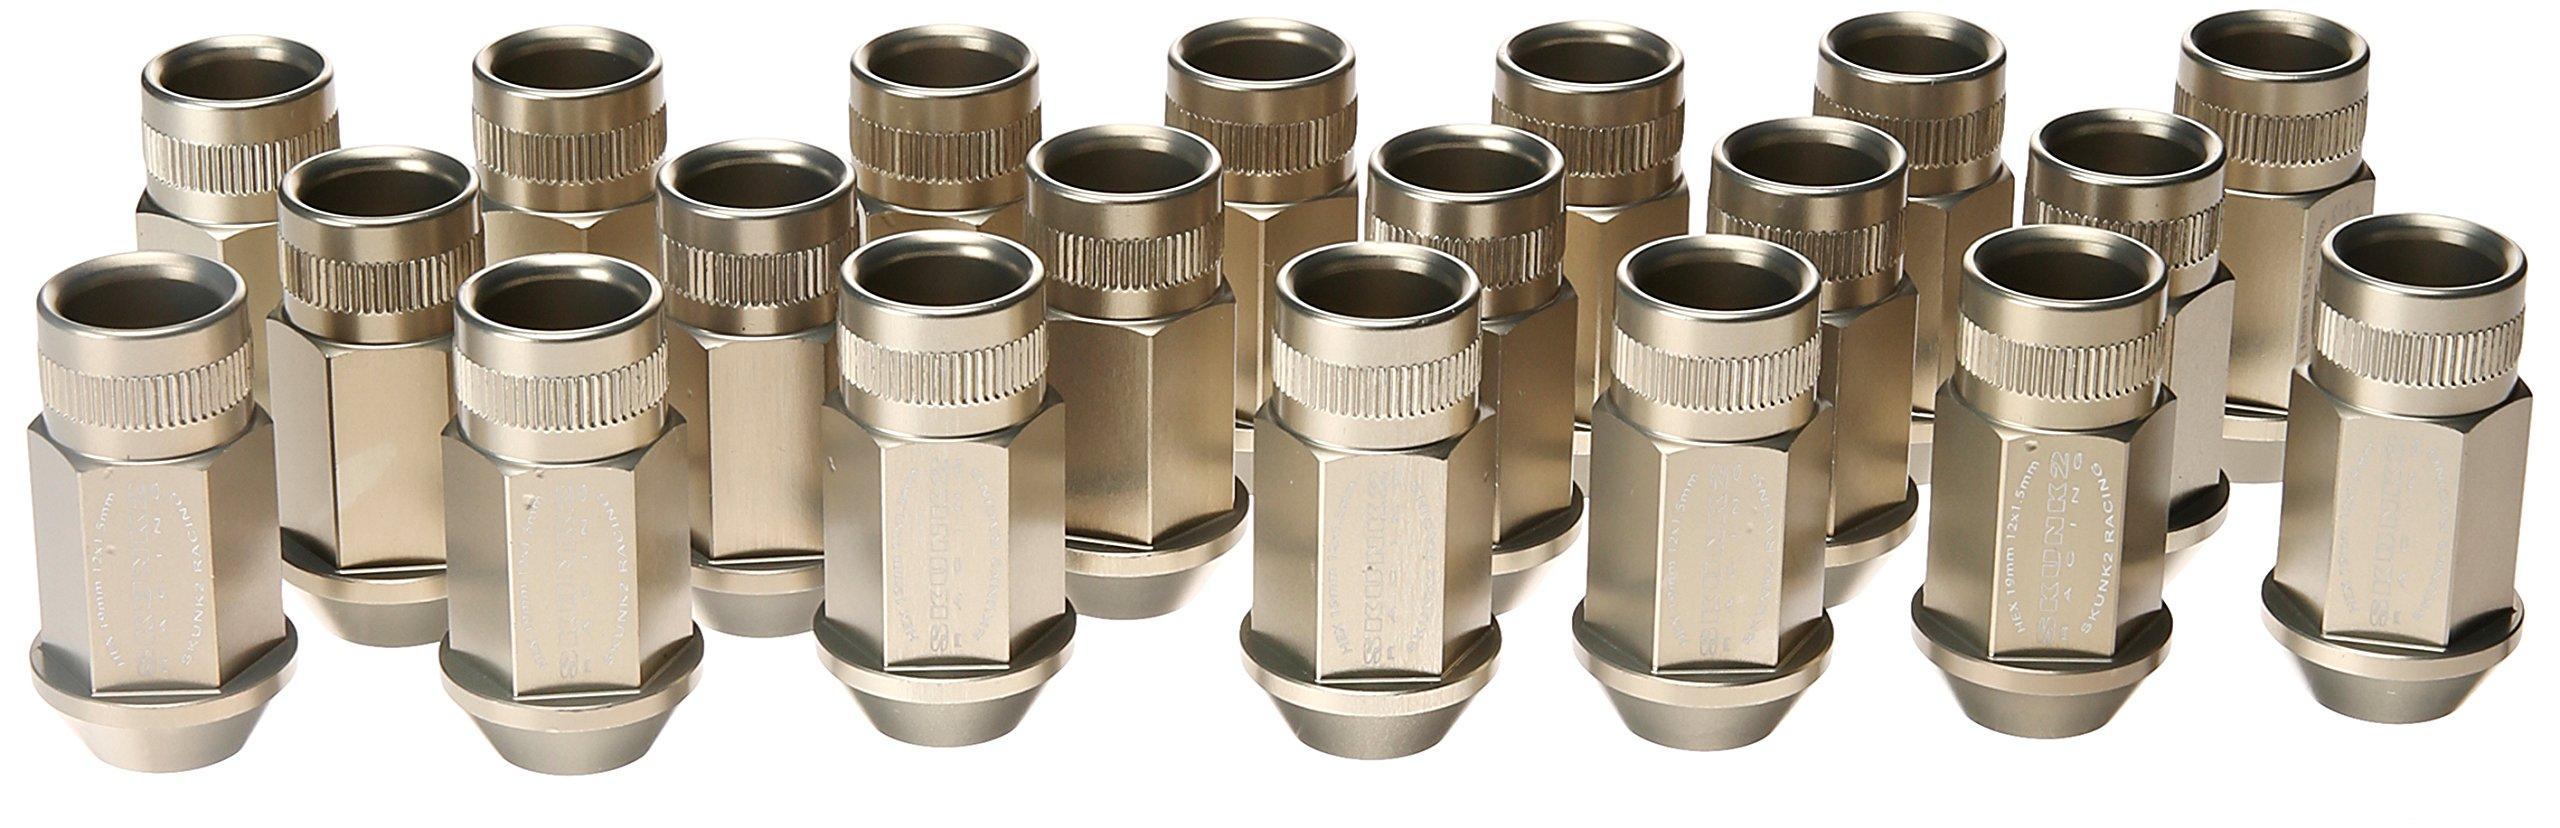 Skunk2 (520-99-0845) Hard Anodized 12mm x 1.5mm Forged Lug Nut Set